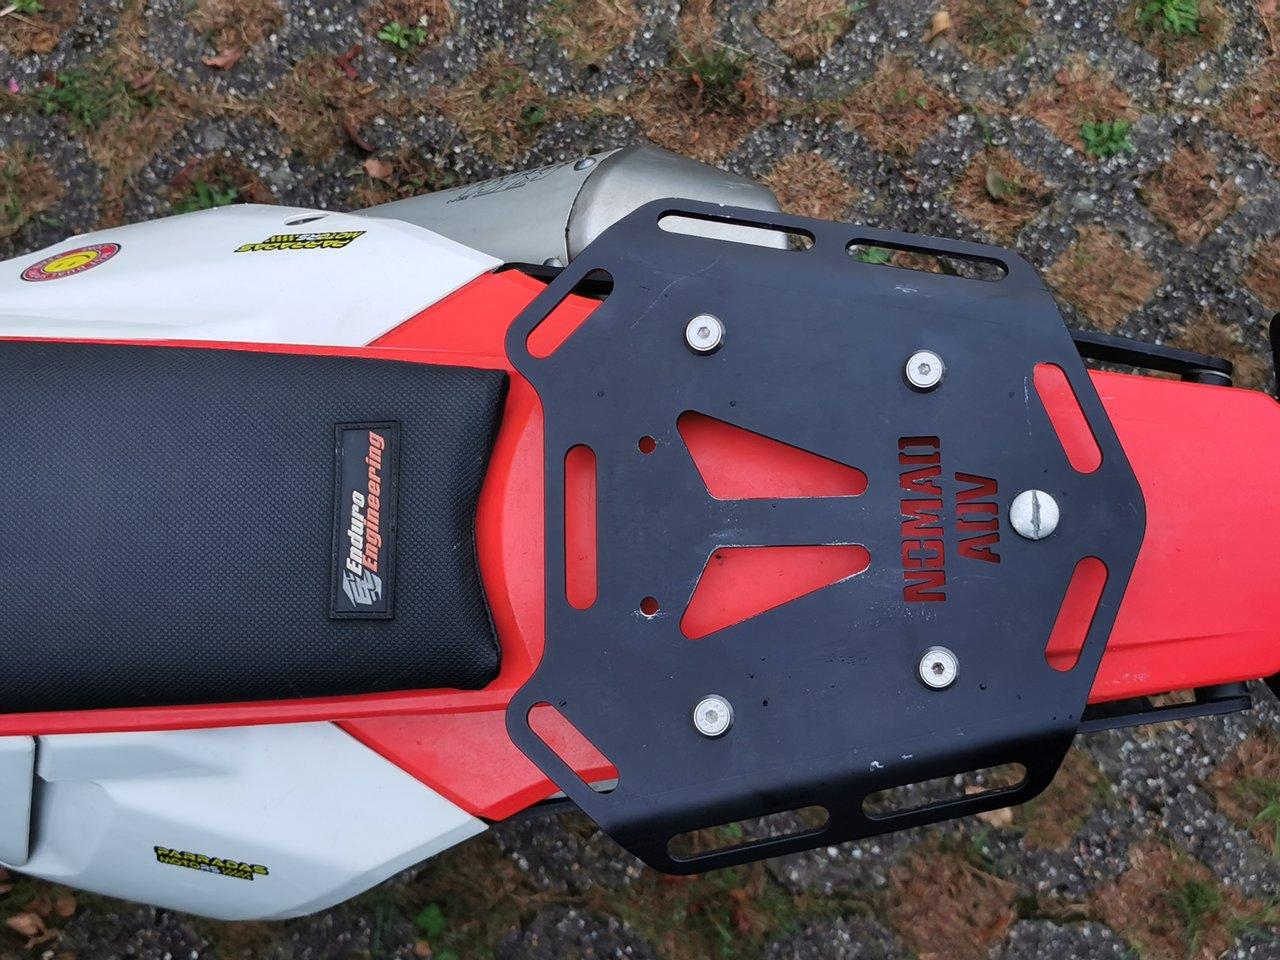 VDS KTM 450 EXC 2019 - utilisation adventure - VENDU 40690376nx